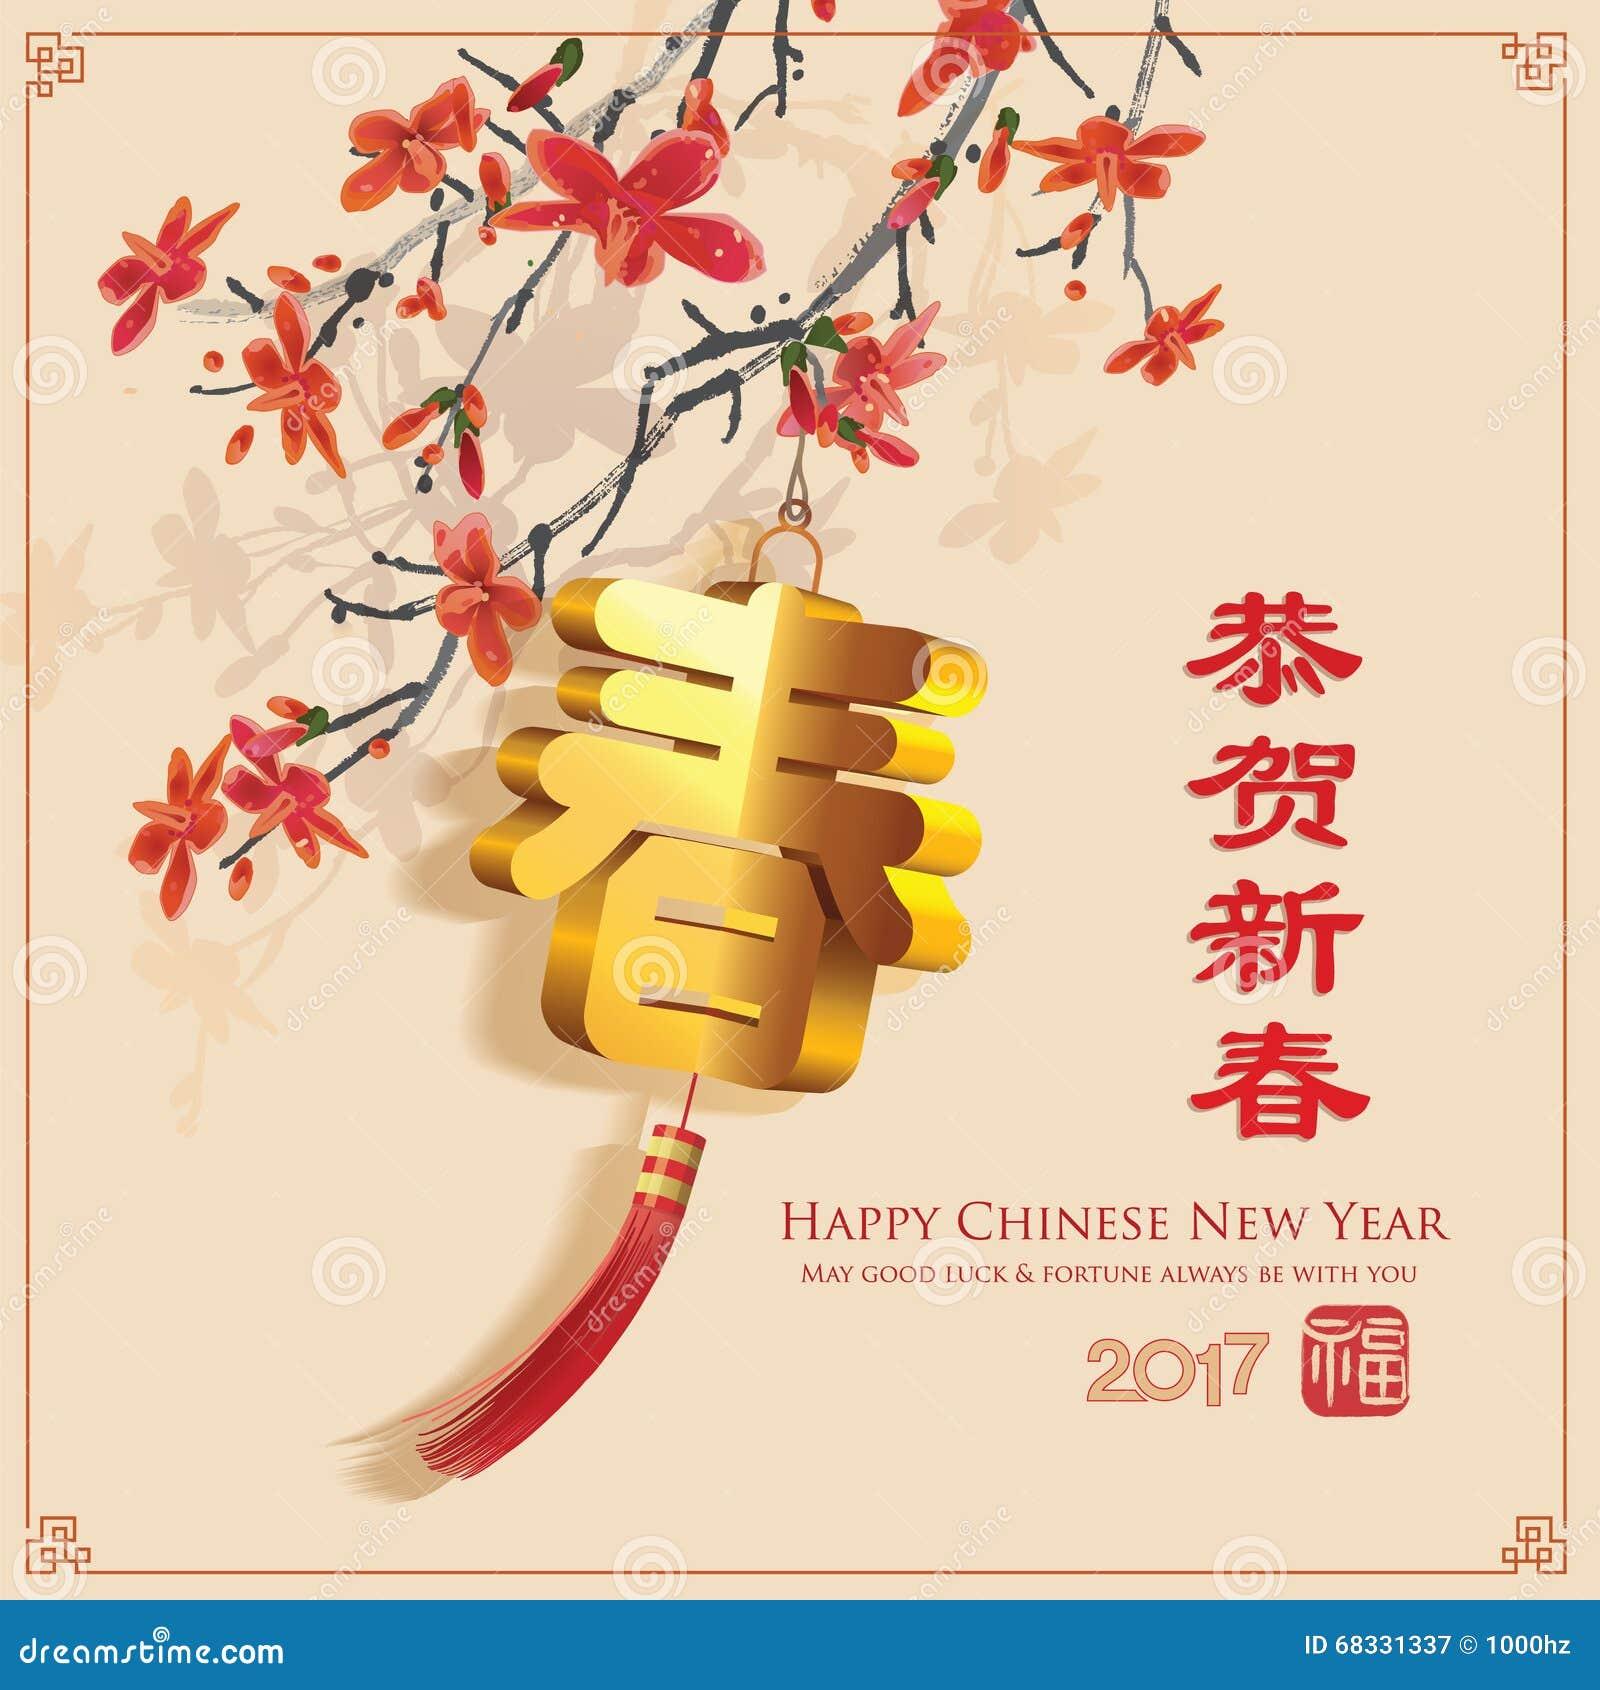 Chinese new year greetings design.